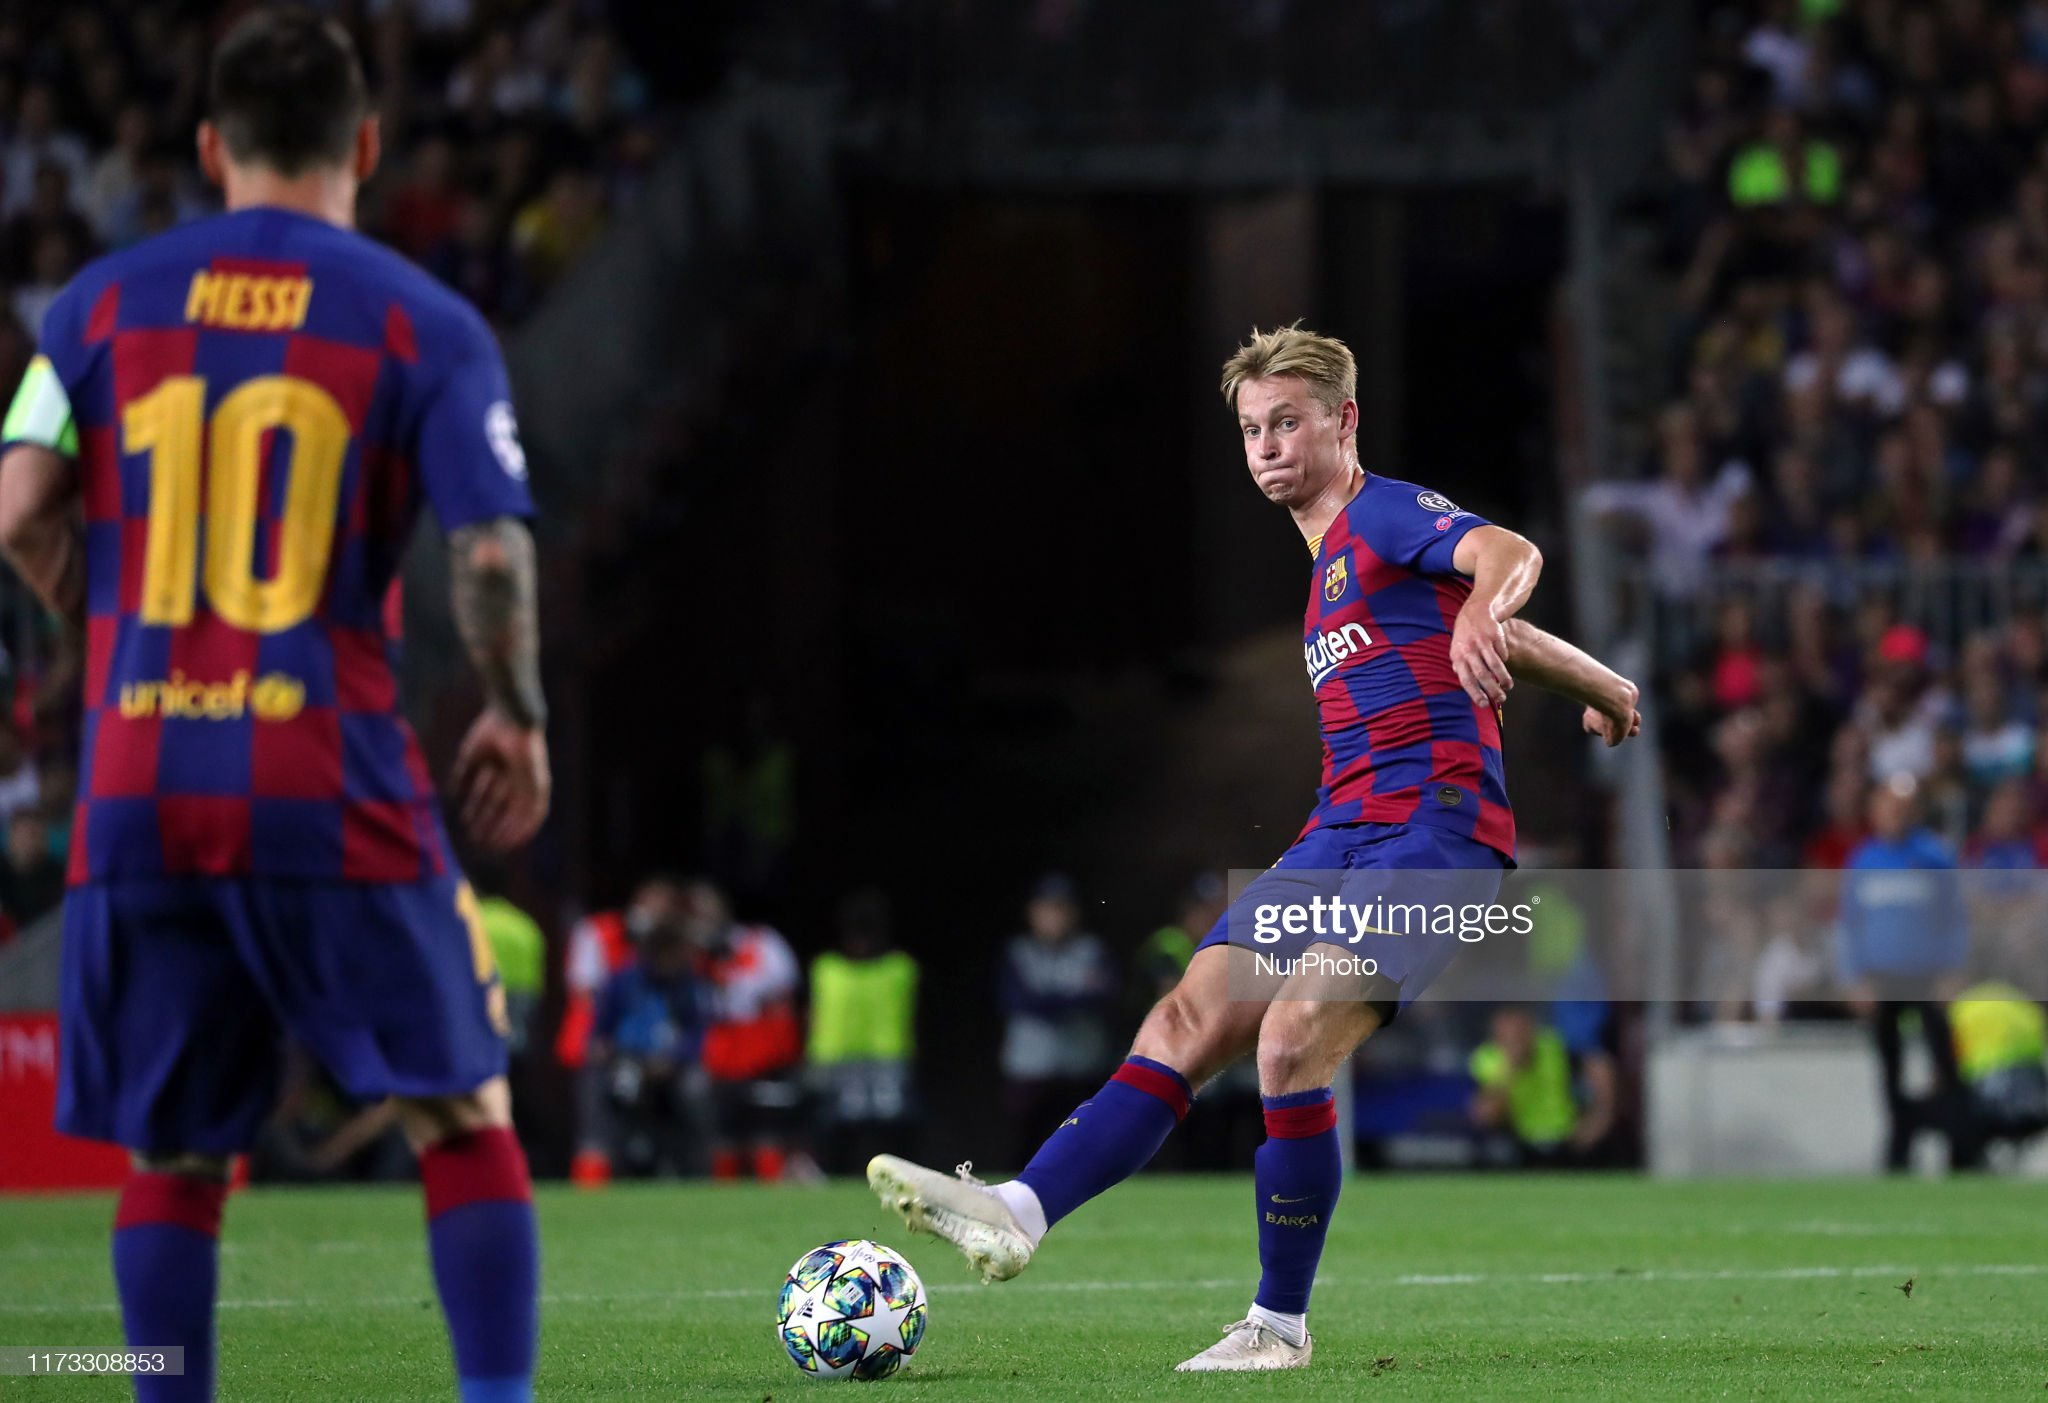 صور مباراة : برشلونة - إنتر 2-1 ( 02-10-2019 )  Frenkie-de-jong-during-the-match-between-fc-barcelona-between-inter-picture-id1173308853?s=2048x2048